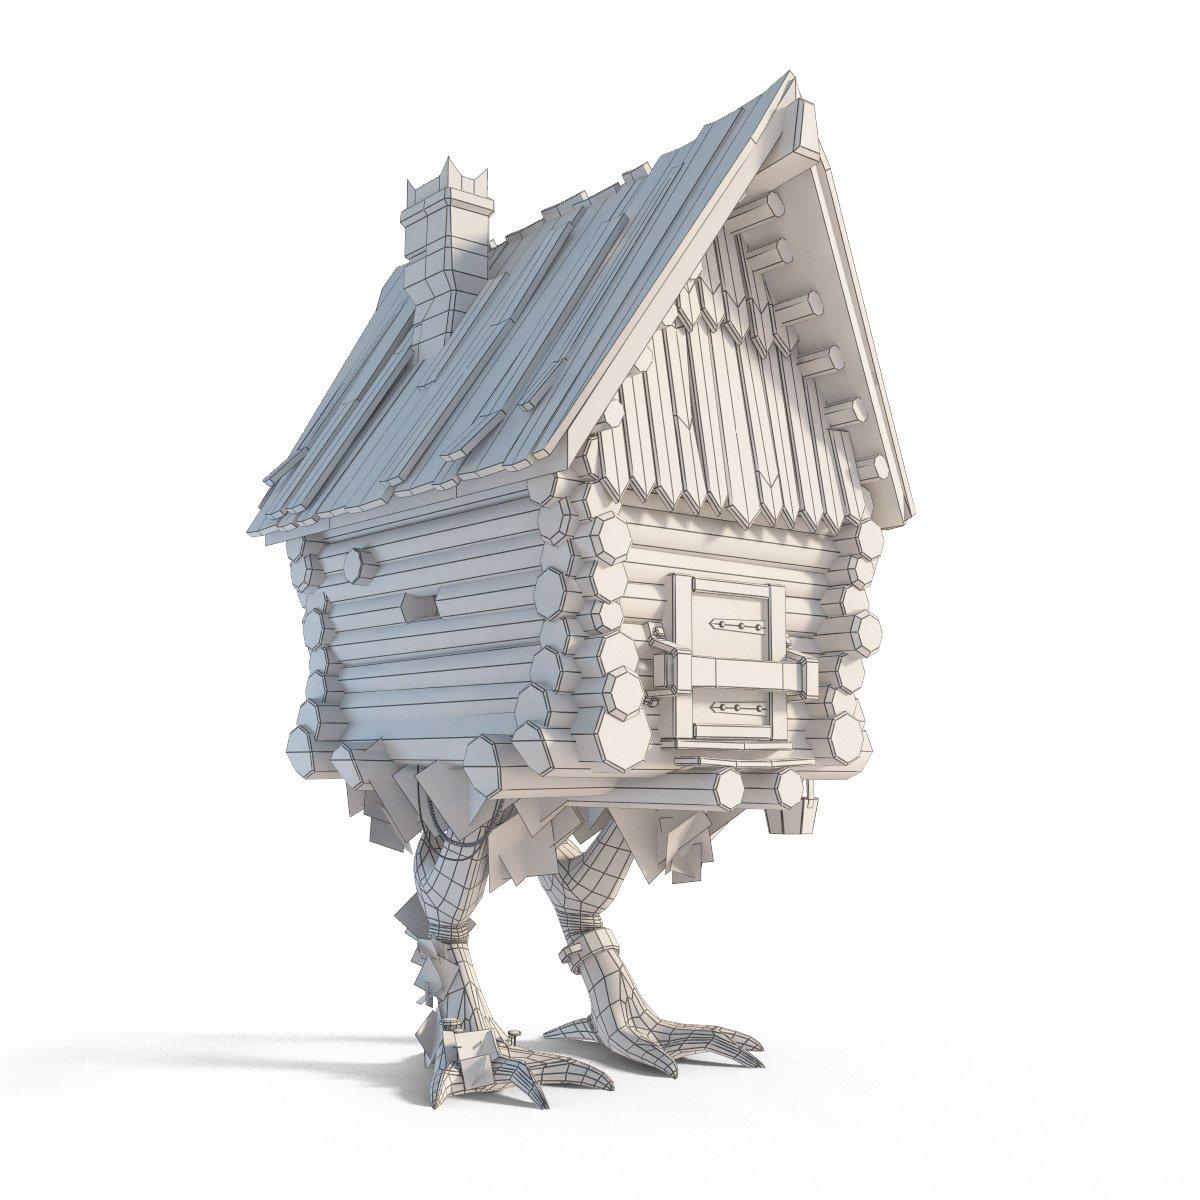 The hut on chicken legs baba yaga modello d in edifici dexport